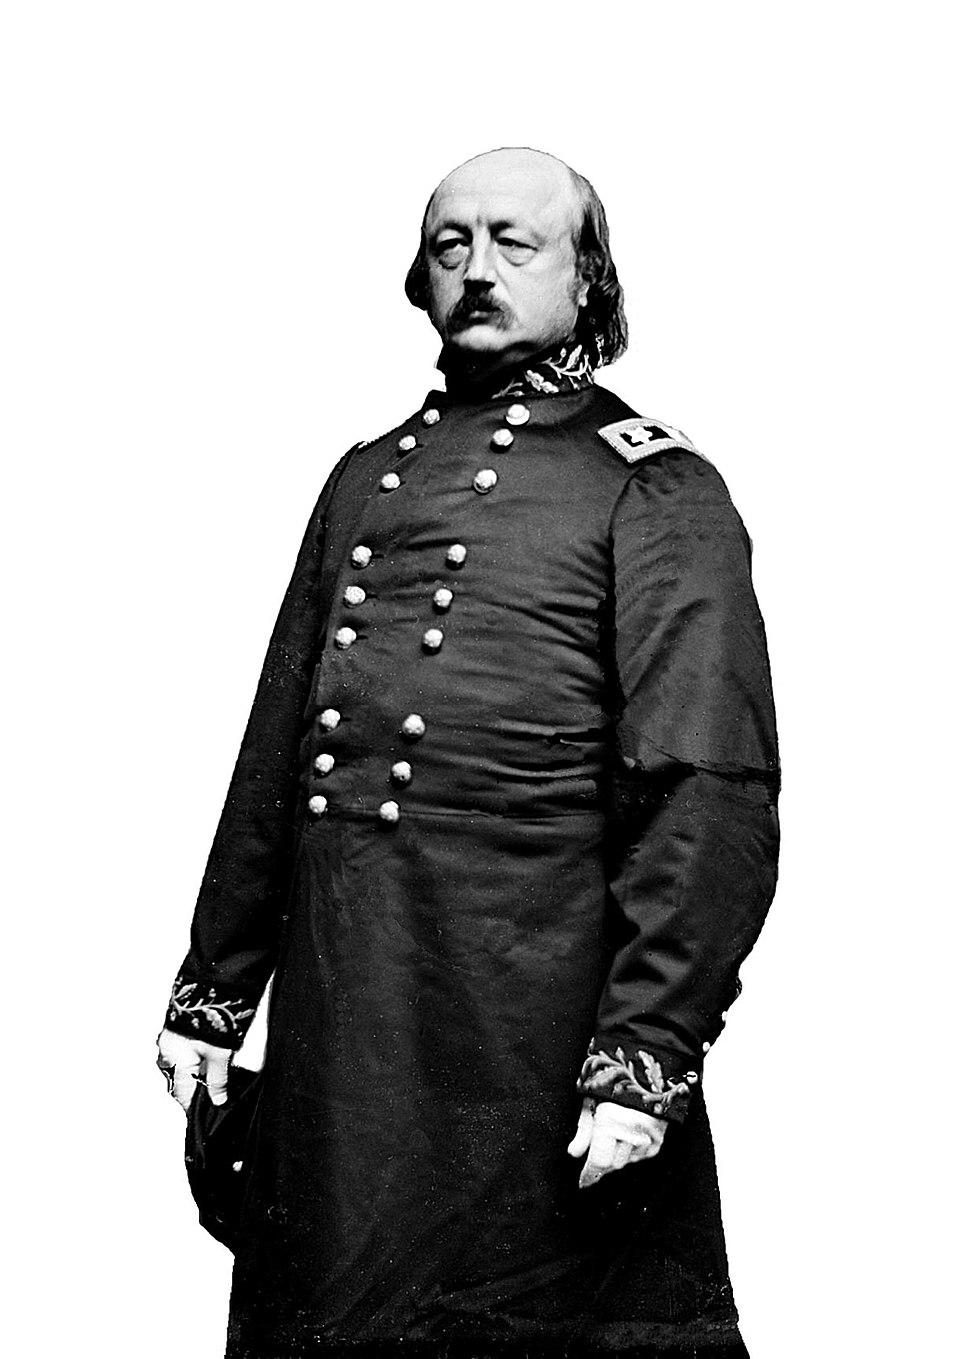 General Benjamin Butler Brady-Handy